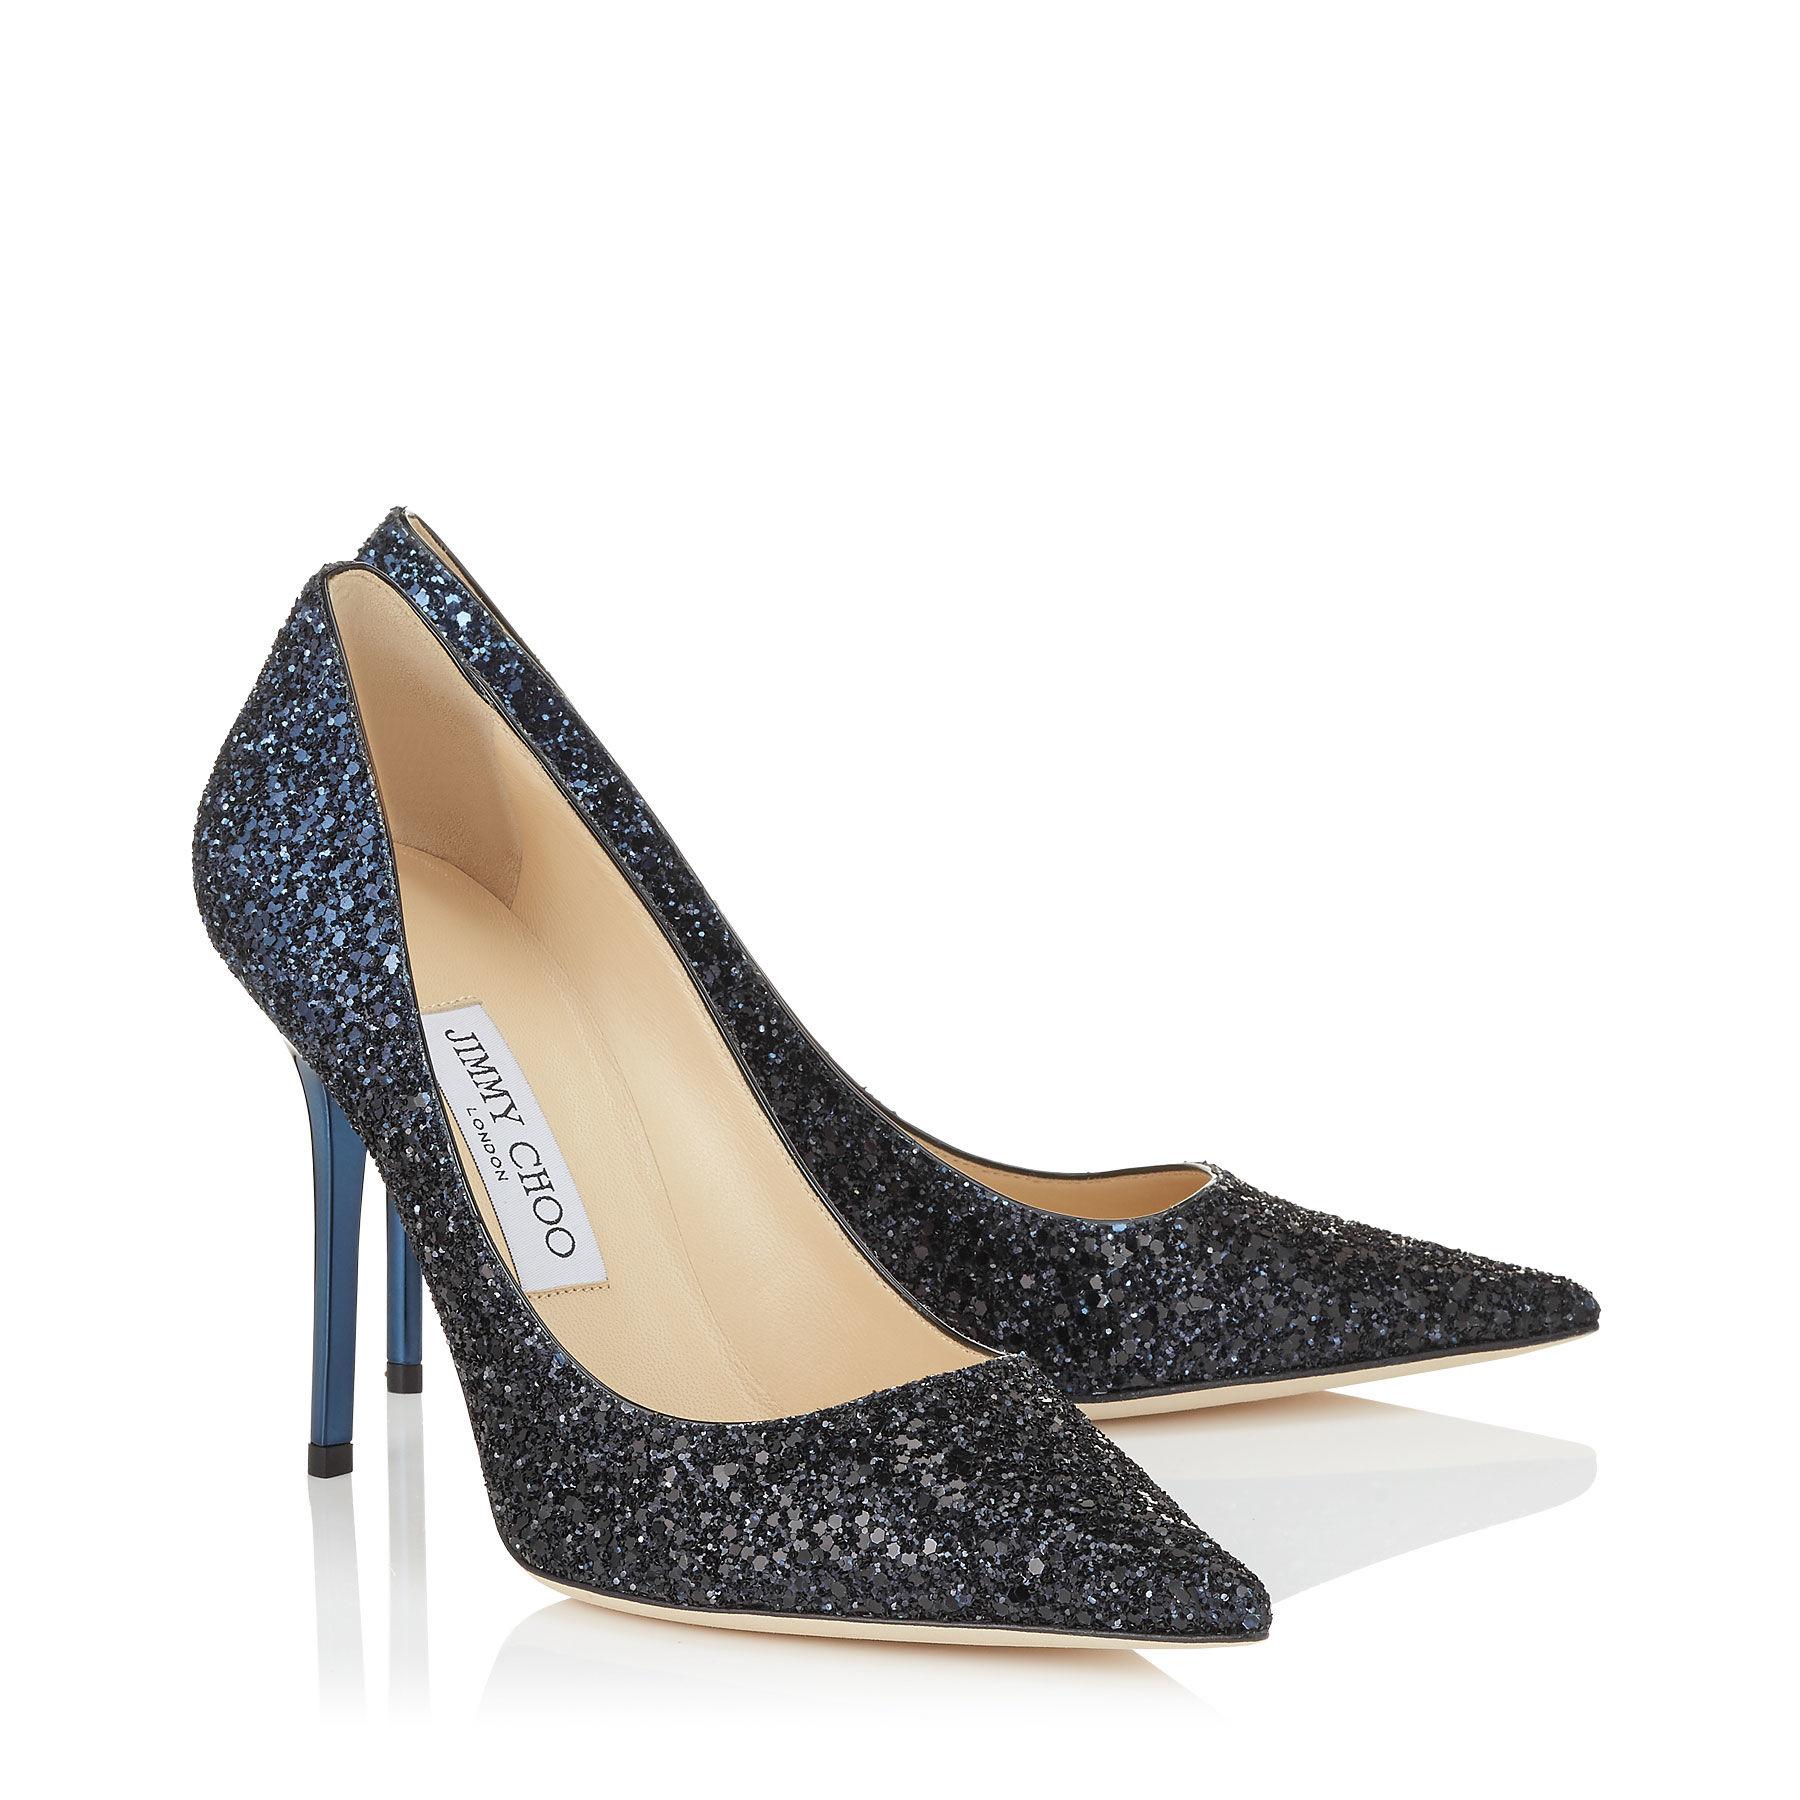 Navy Blue Glitter Court Shoes